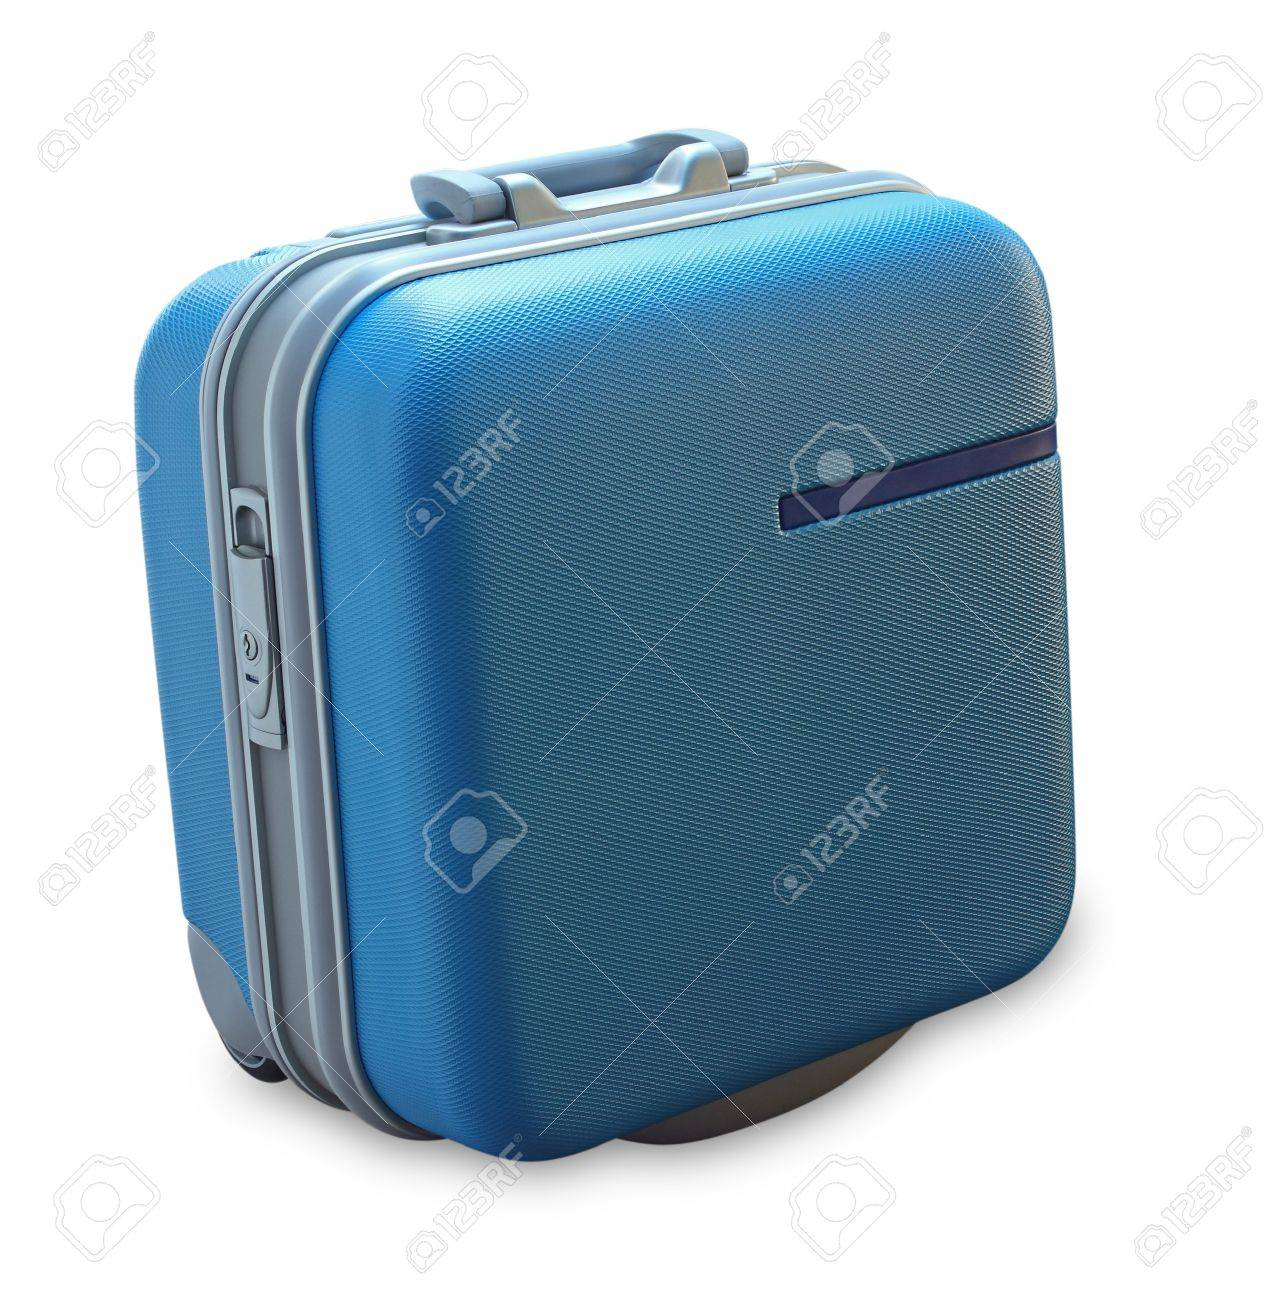 Suitcase isolated on a white background Stock Photo - 9391545